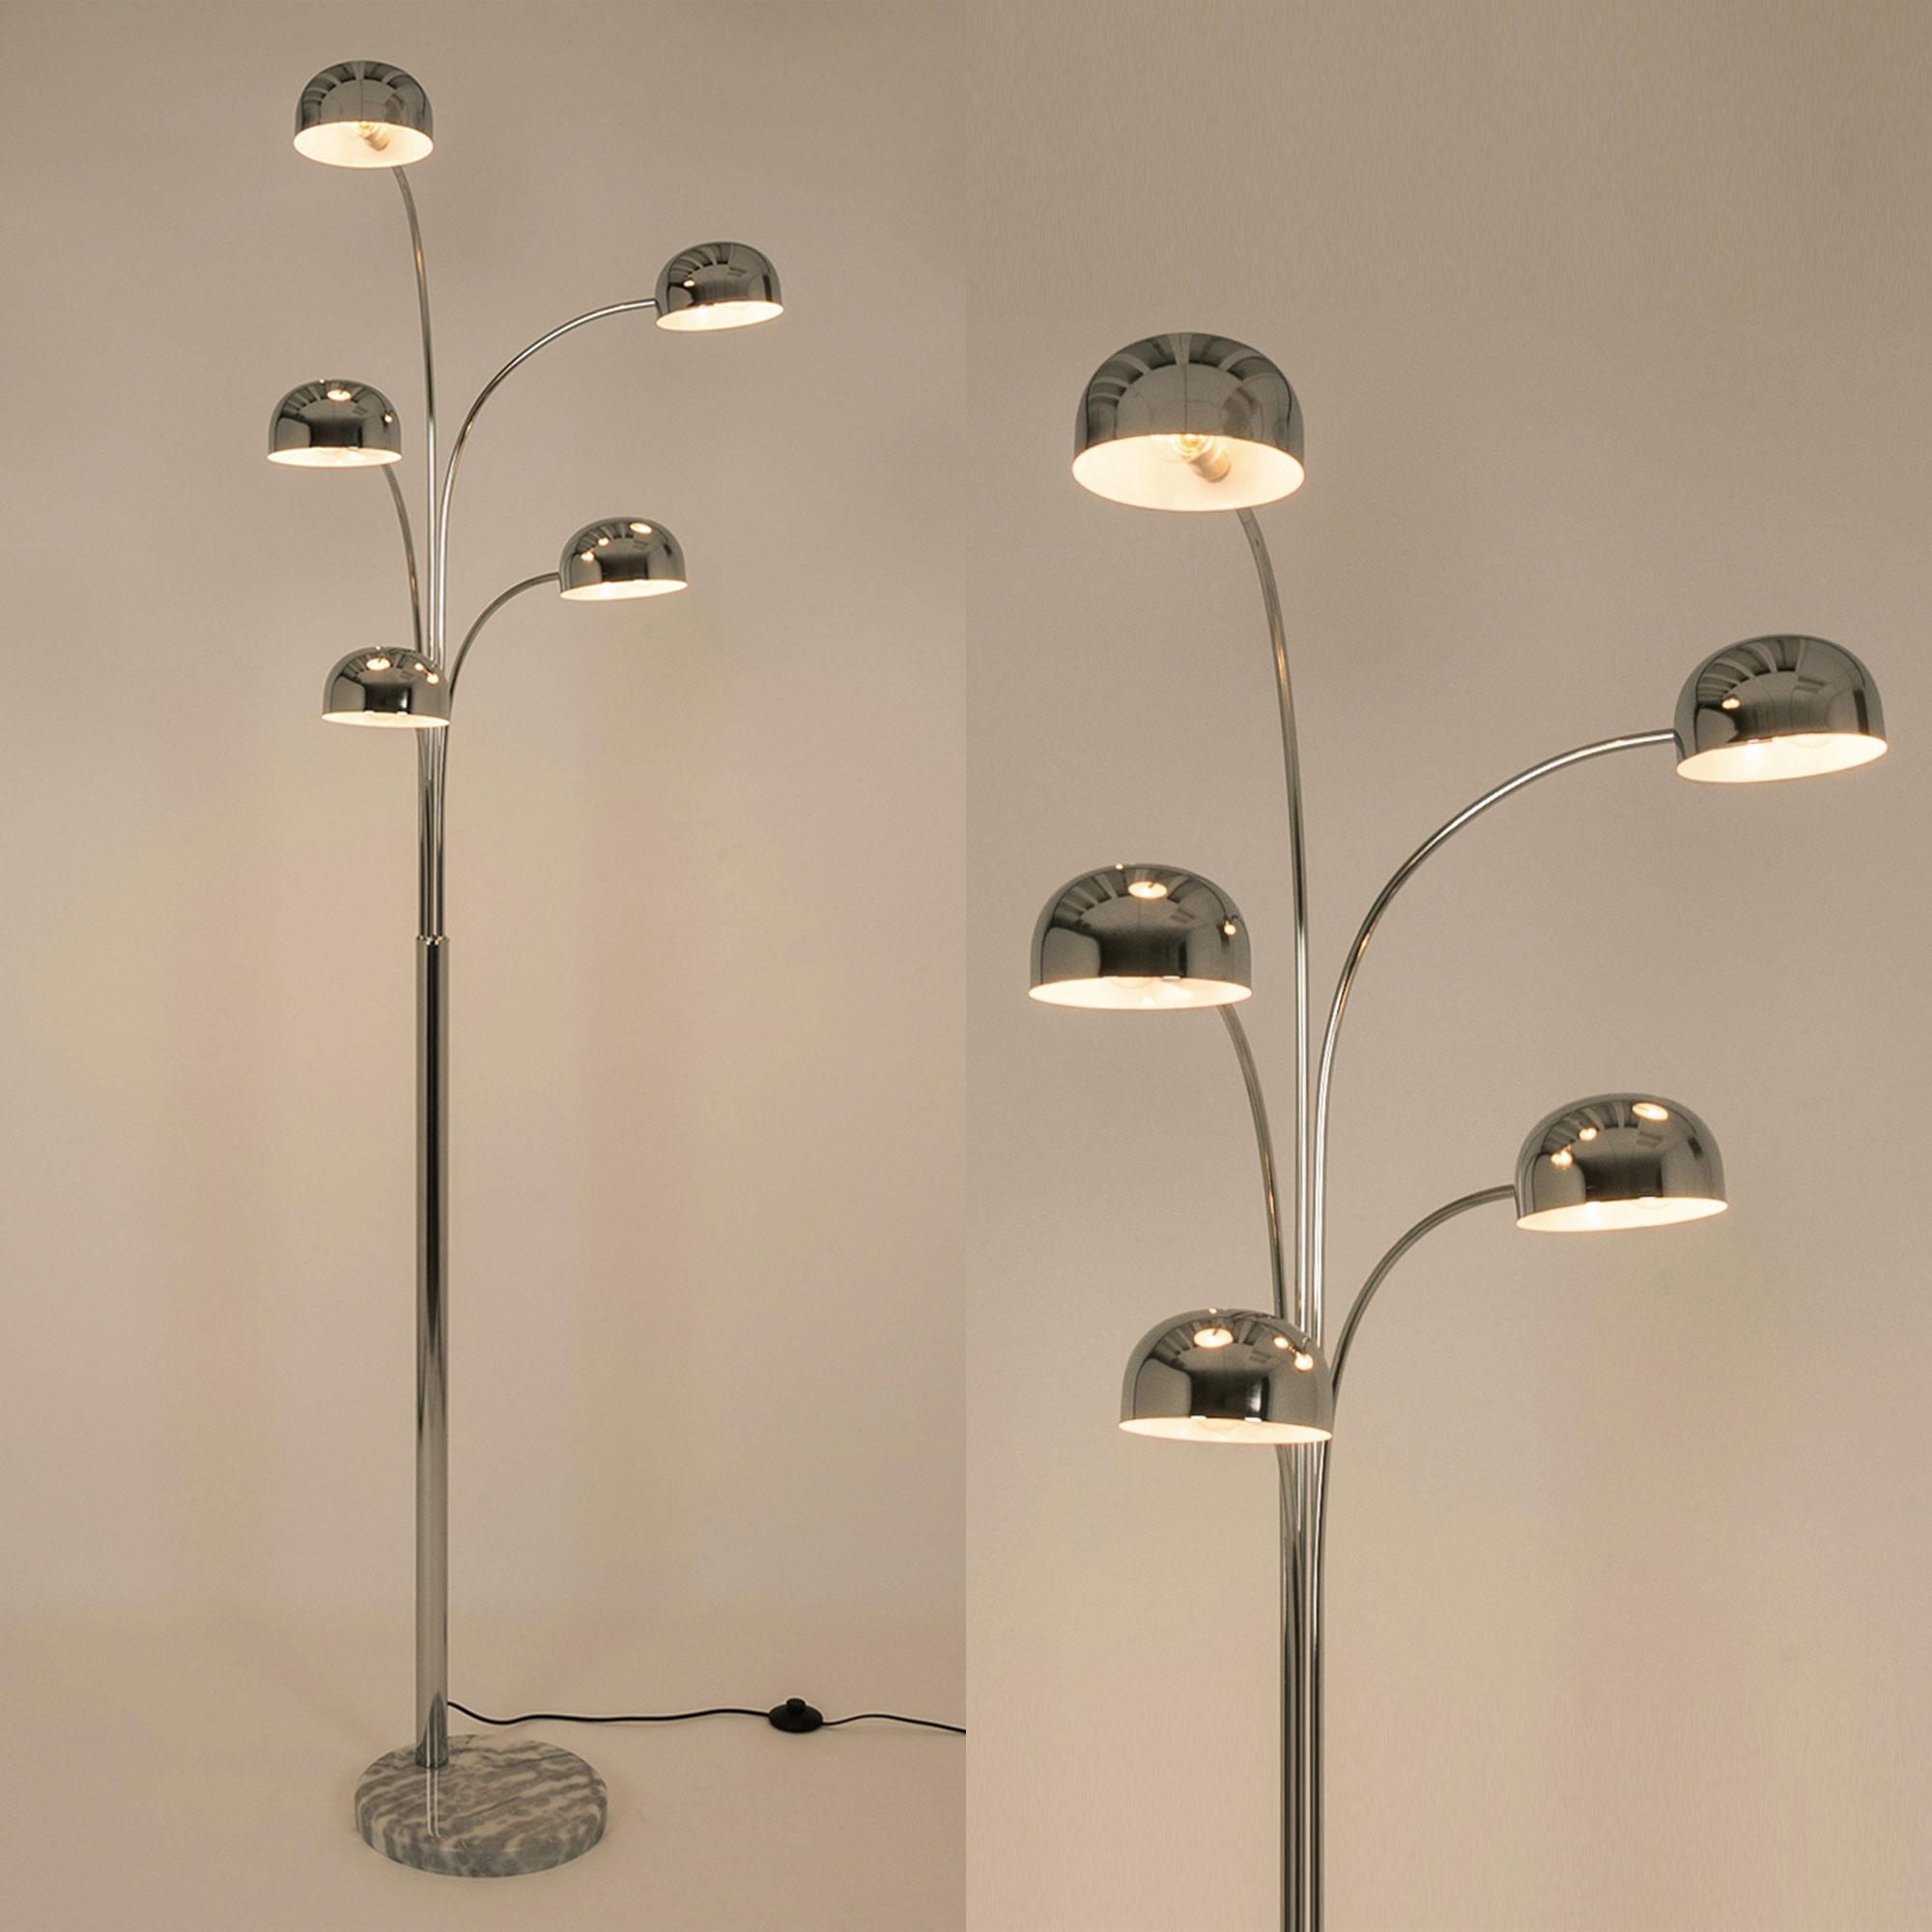 den 5 arm chrome floor lamp all lighting. Black Bedroom Furniture Sets. Home Design Ideas